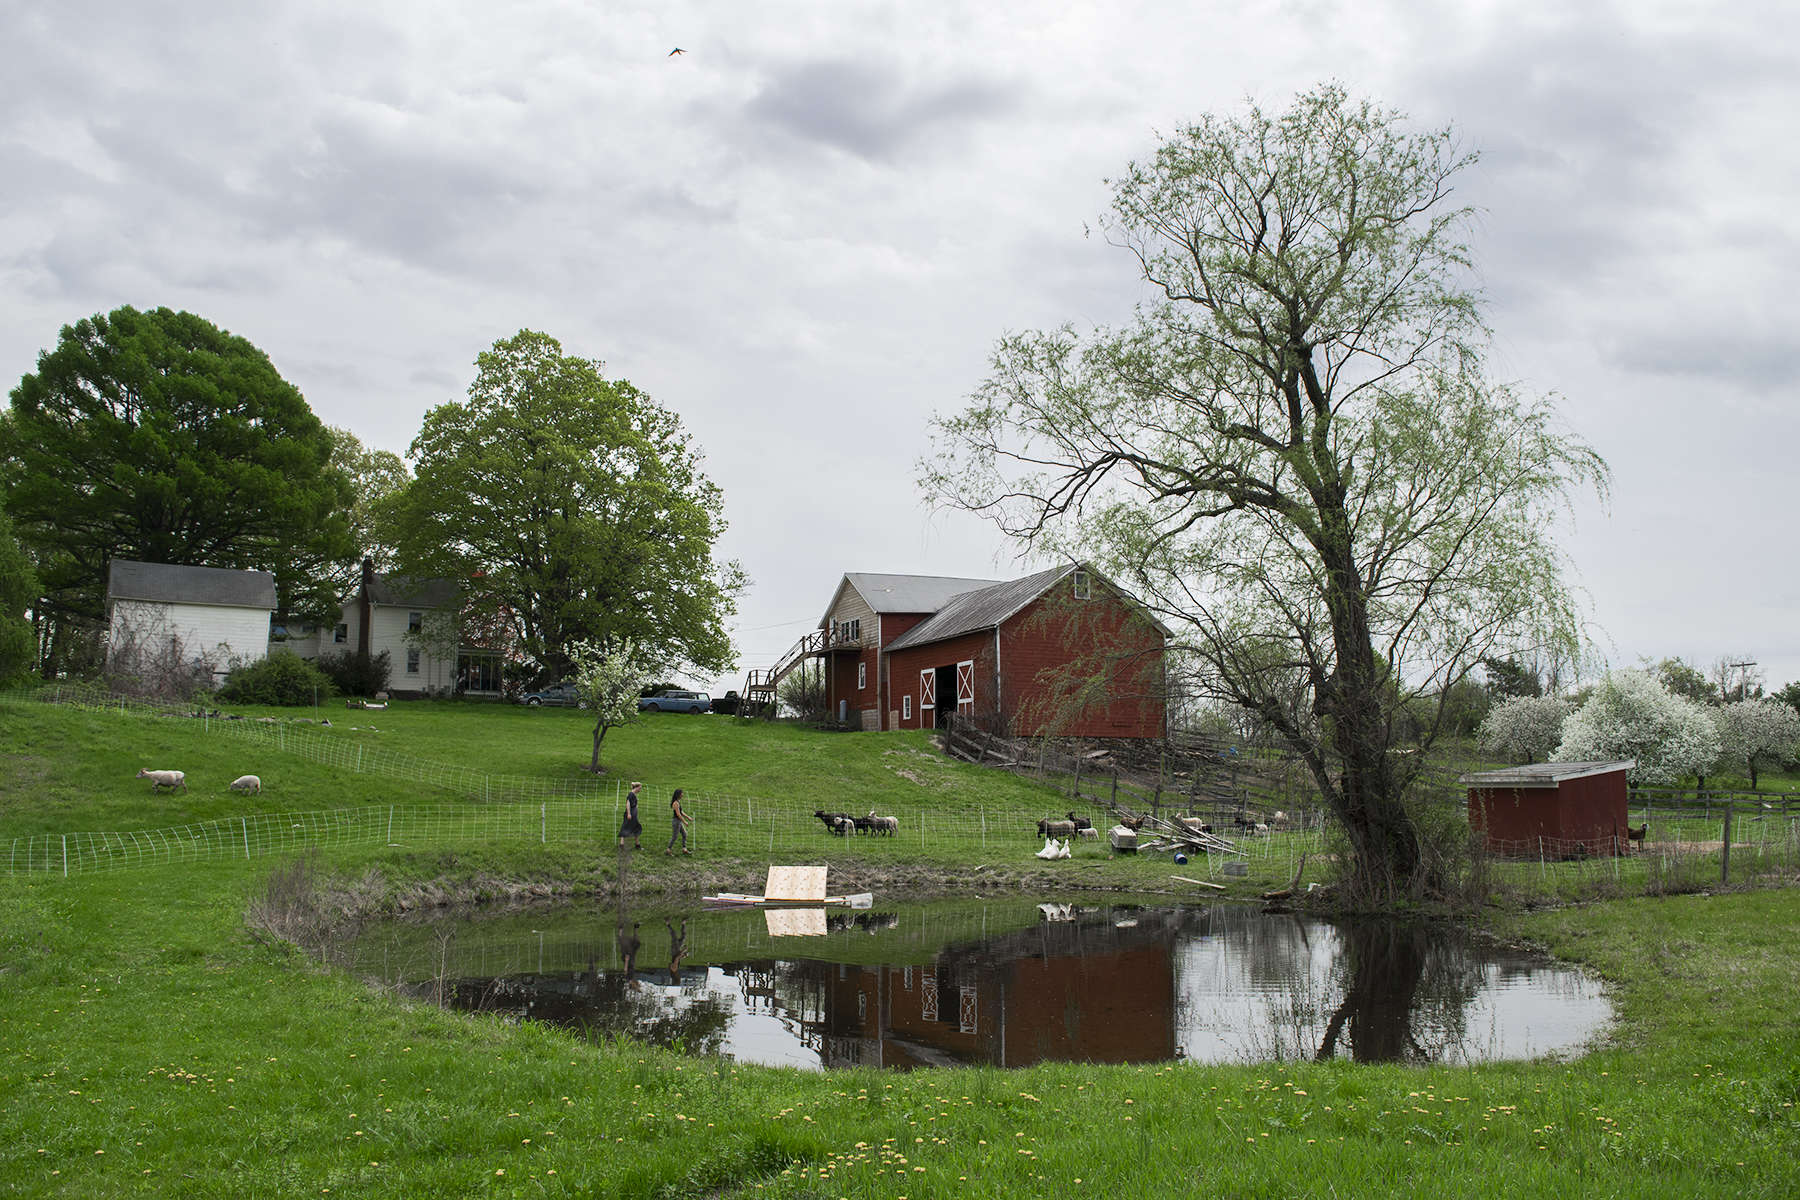 Gatherwild Ranch RV & Tent Site